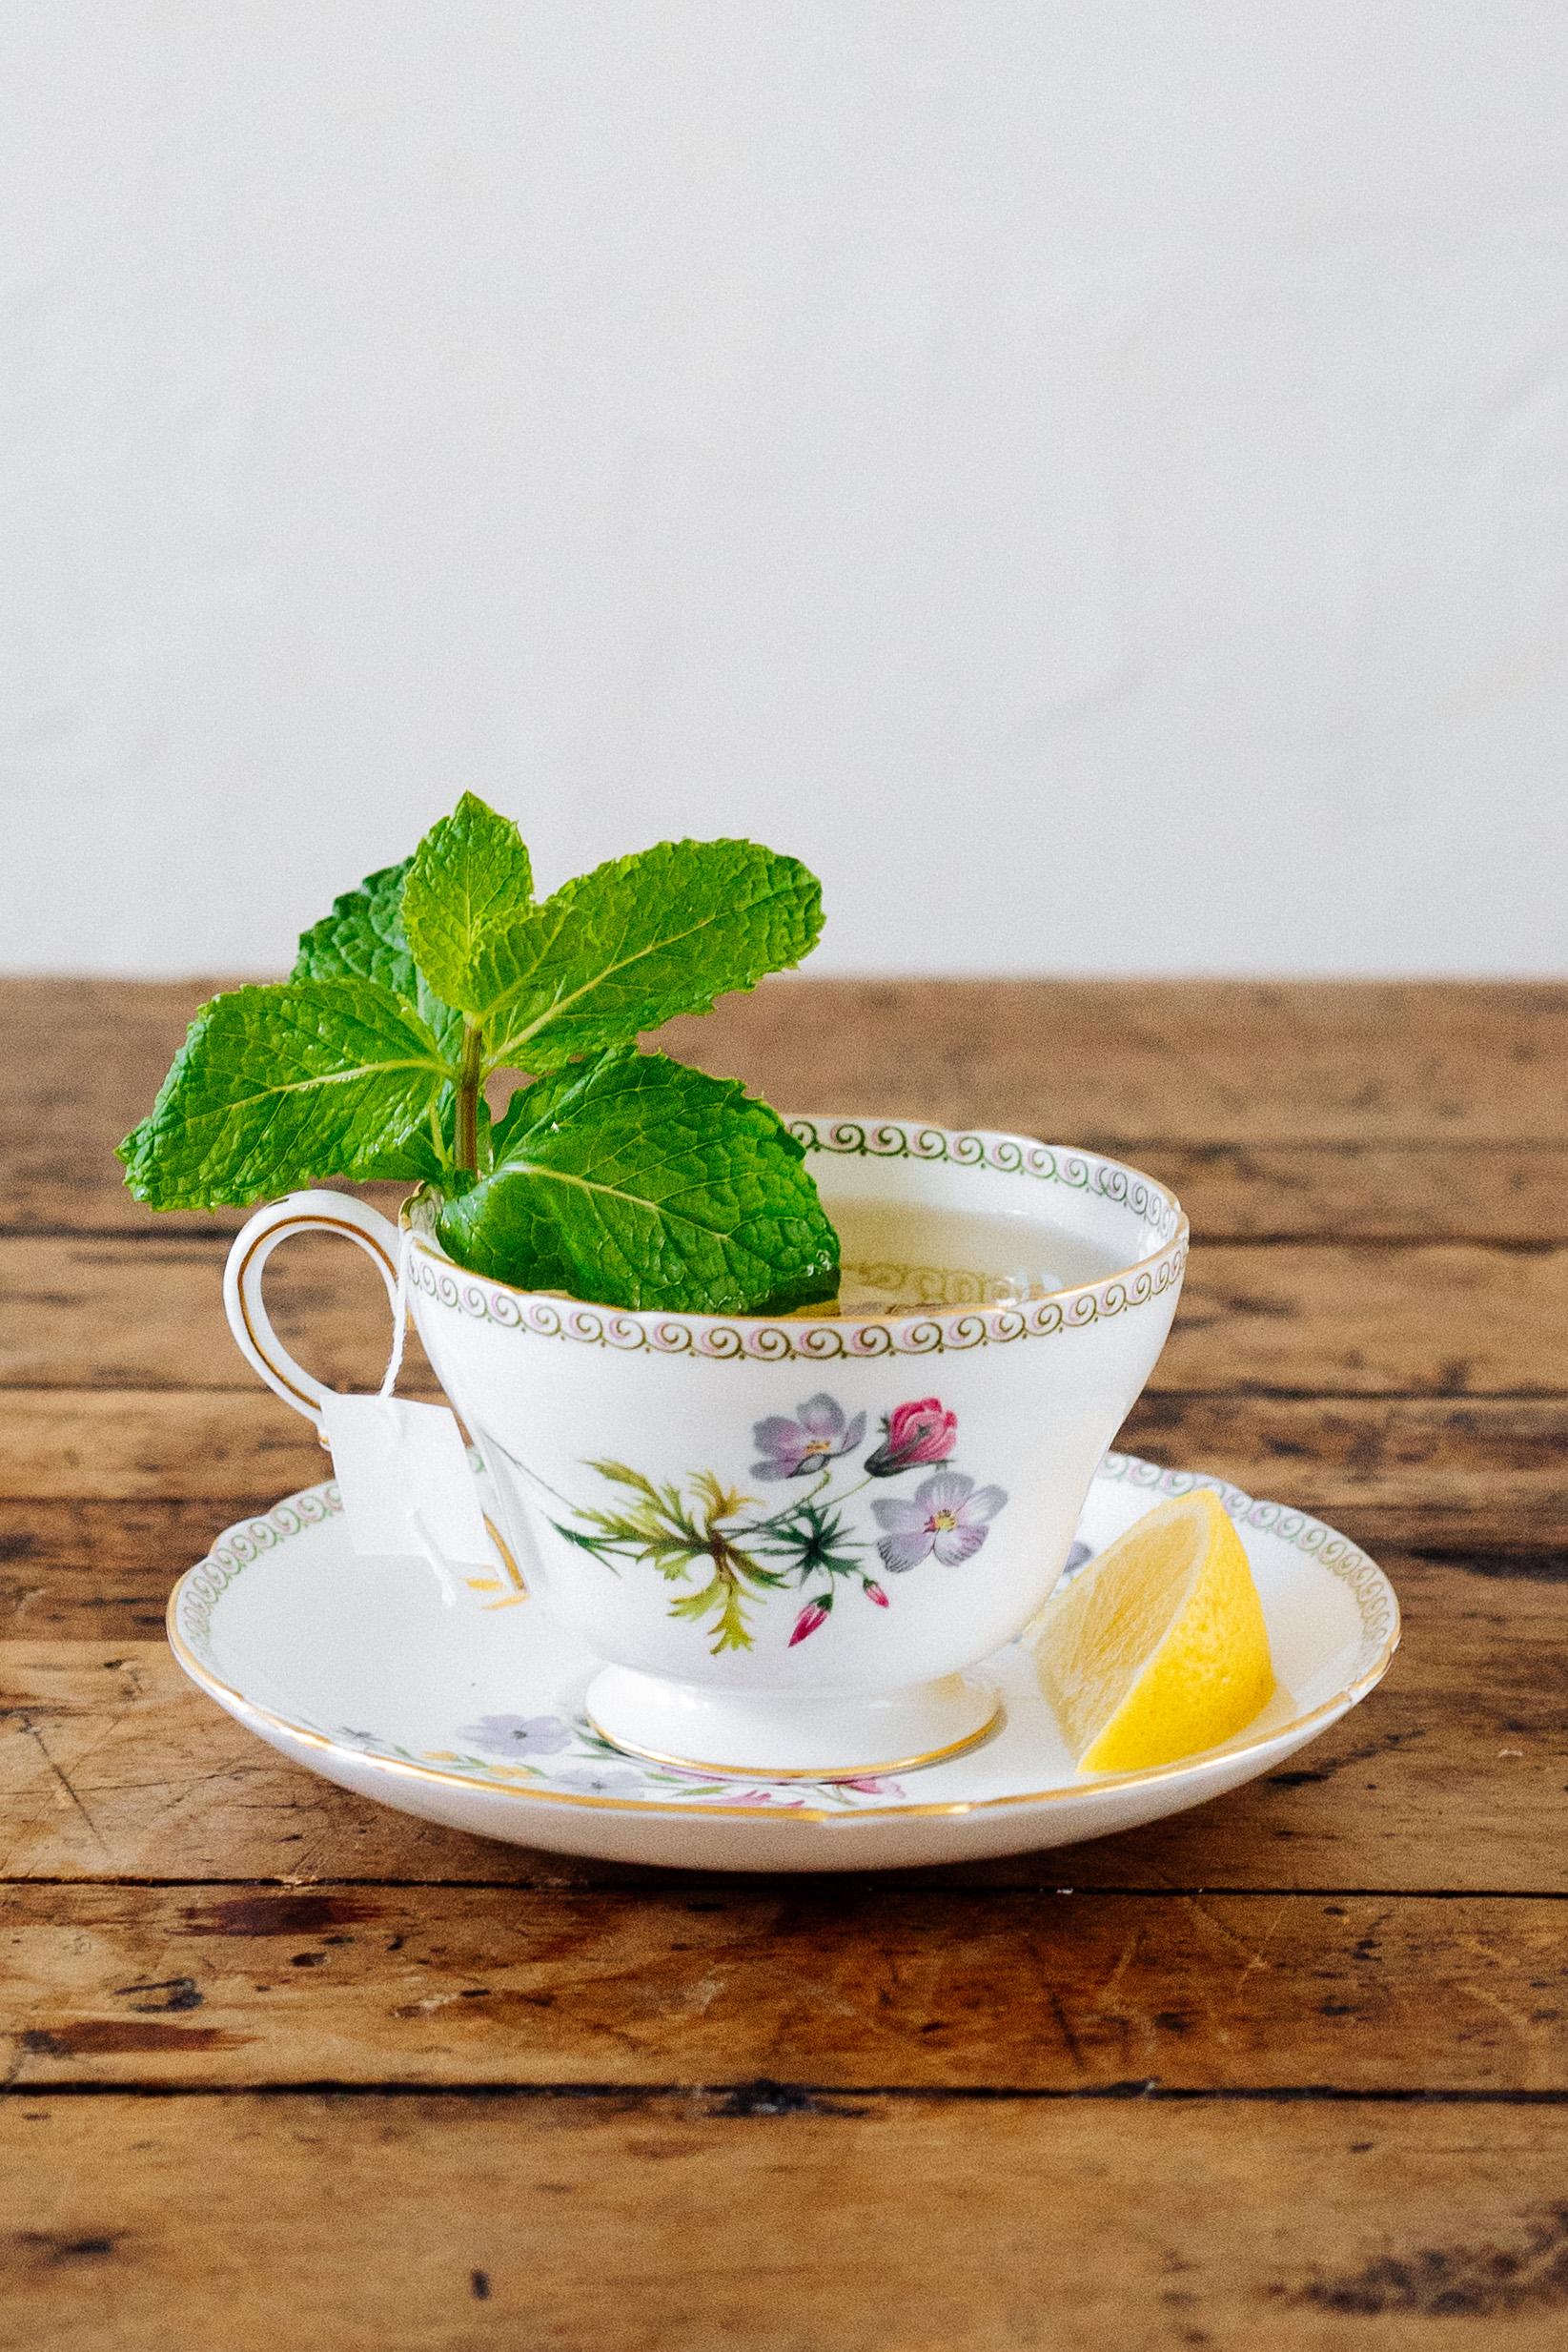 HOT TODDY   1 1/2 oz Chareau  1/4 oz Honey  1/4 oz Lemon Juice  1 Tea Bag (green tea or mint)  Add Chareau, honey, and lemon juice to cup of hot tea. Garnish with a lemon wedge and fresh mint.